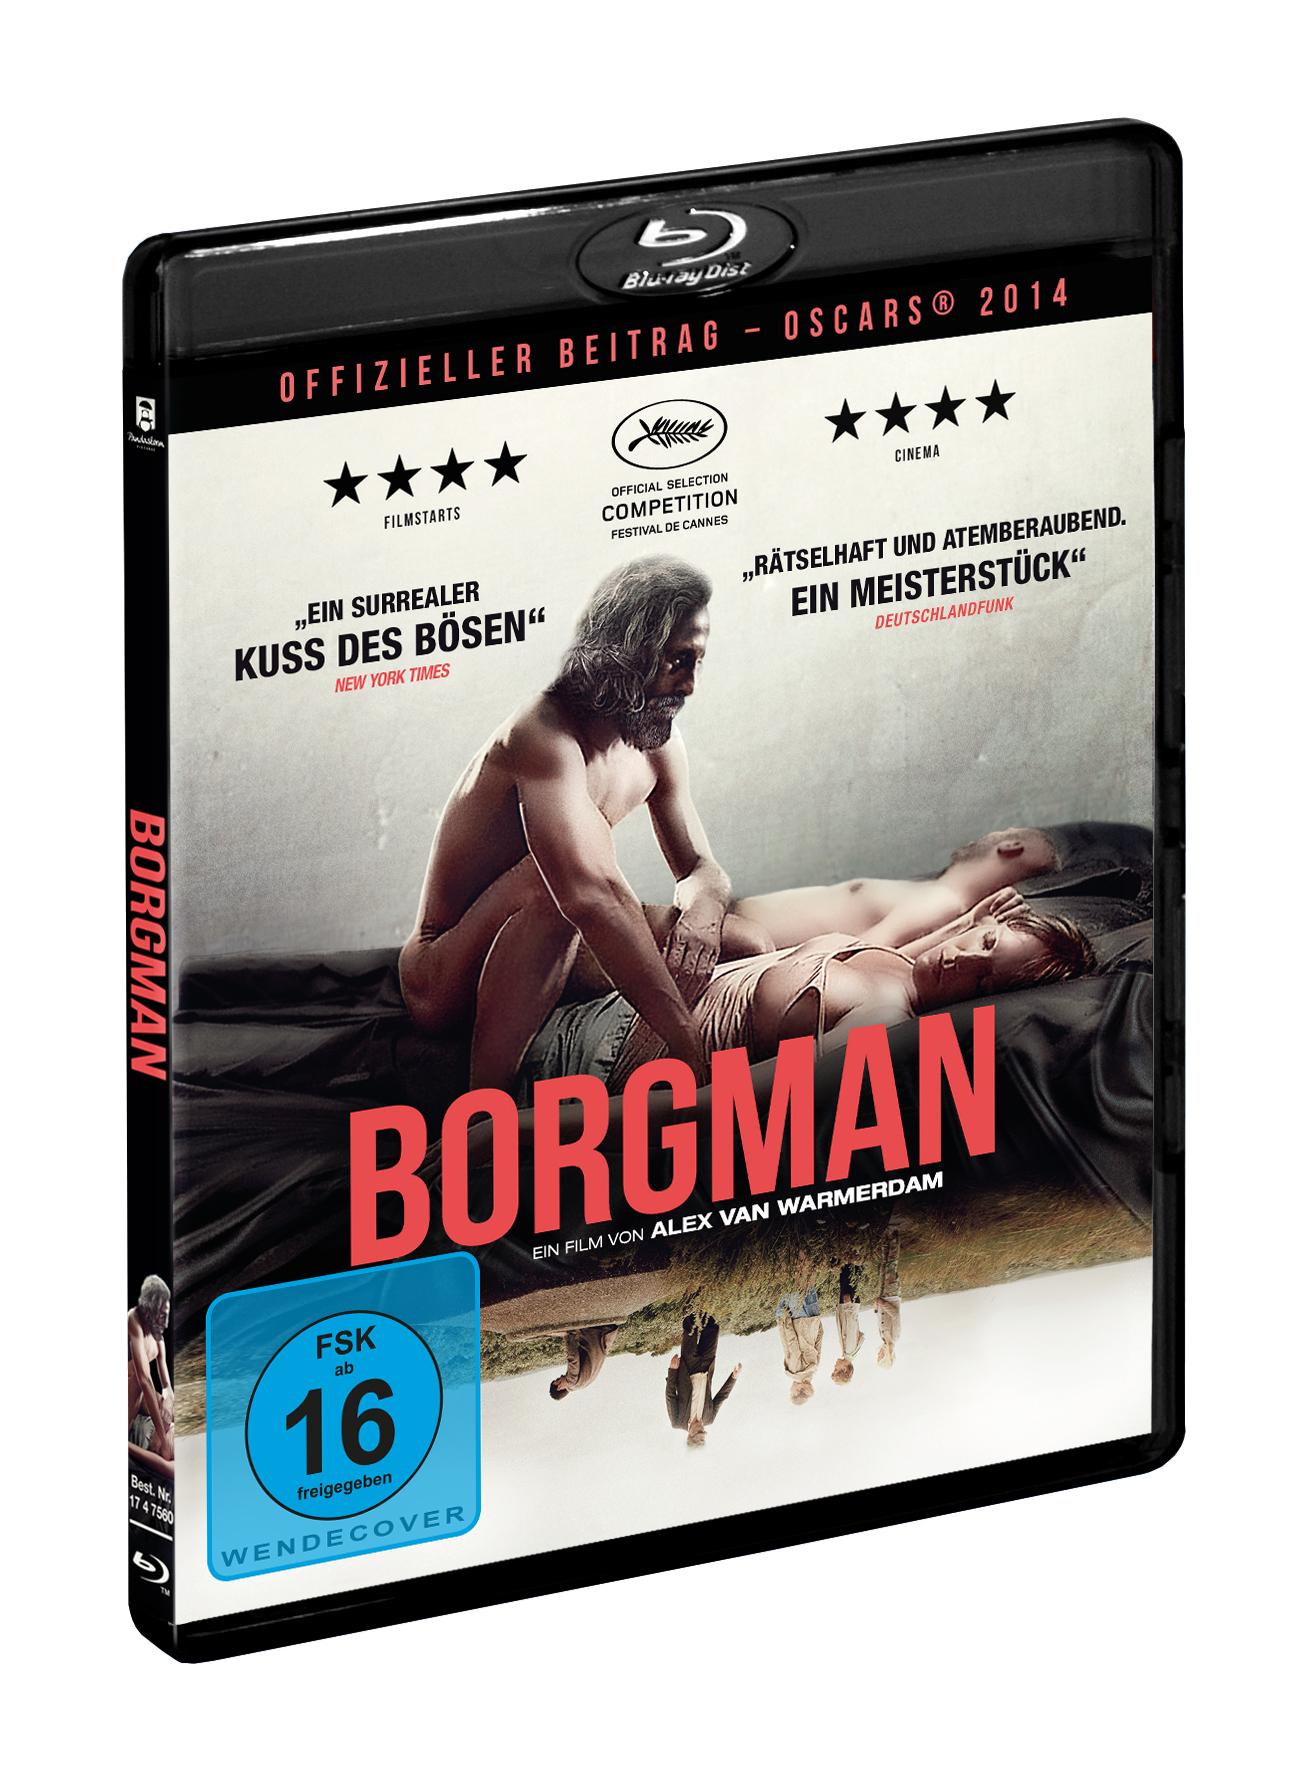 Borgman BluRay